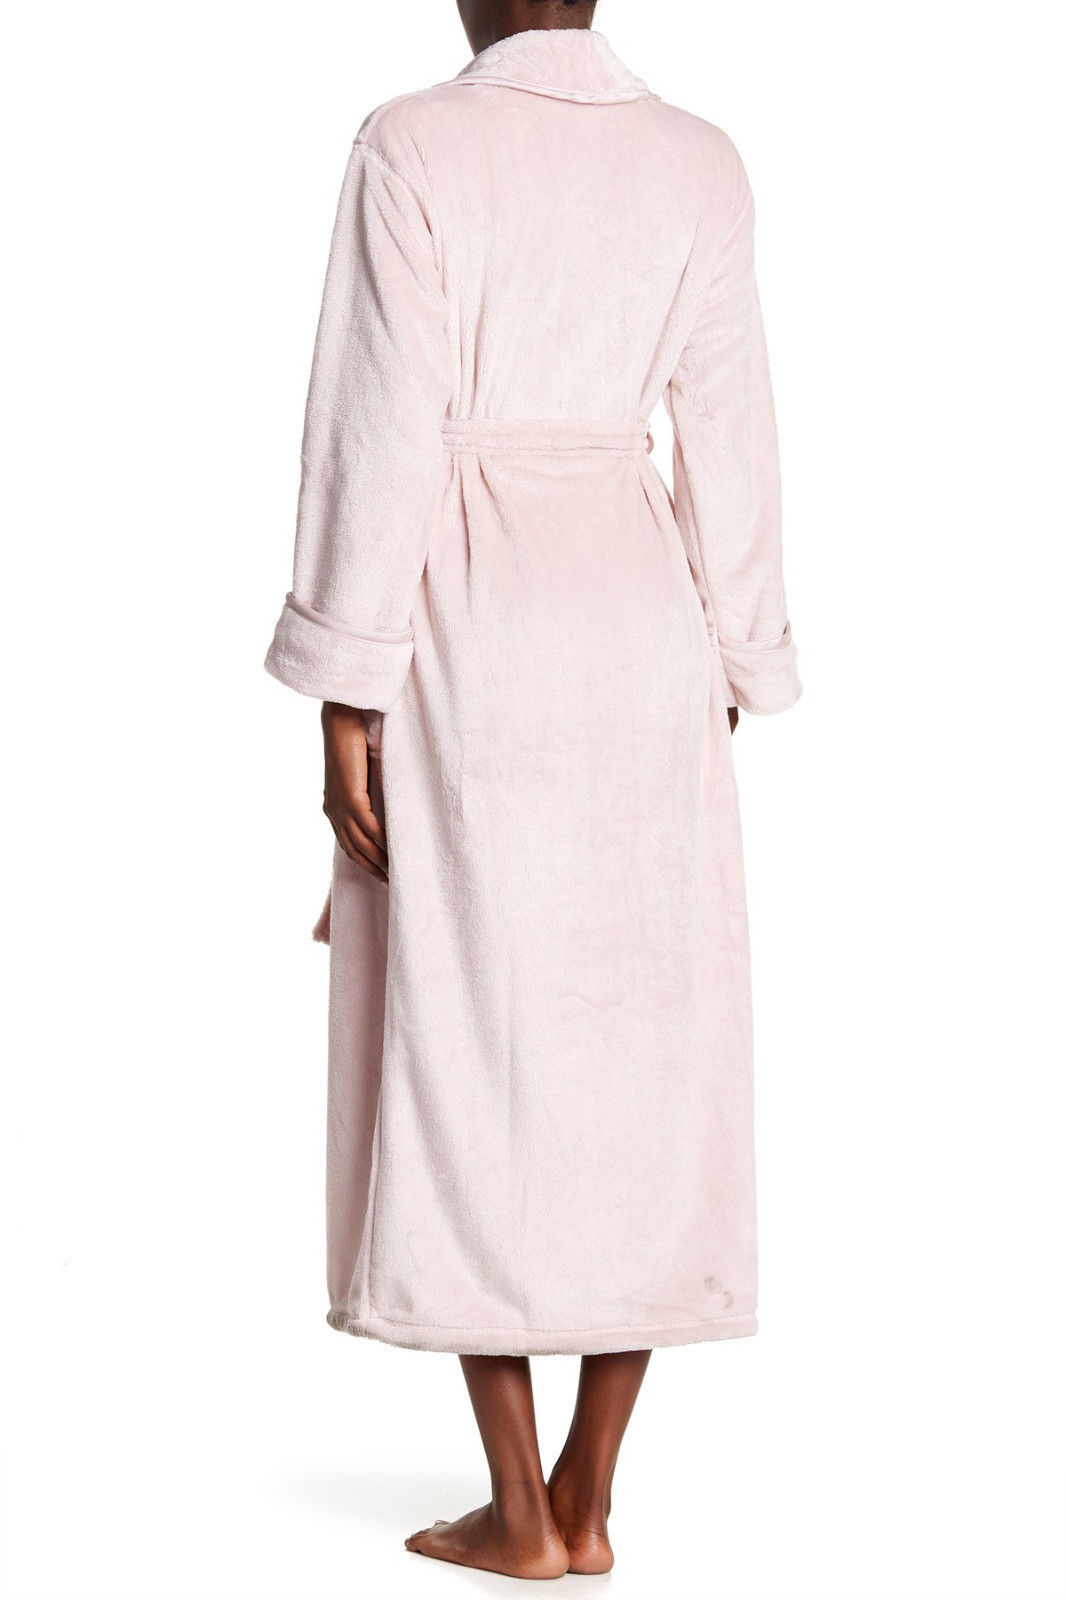 NWT New Natori Pink Faux Fur Robe Womens Long Very Soft Pockets M Dusty Rose Lus image 7